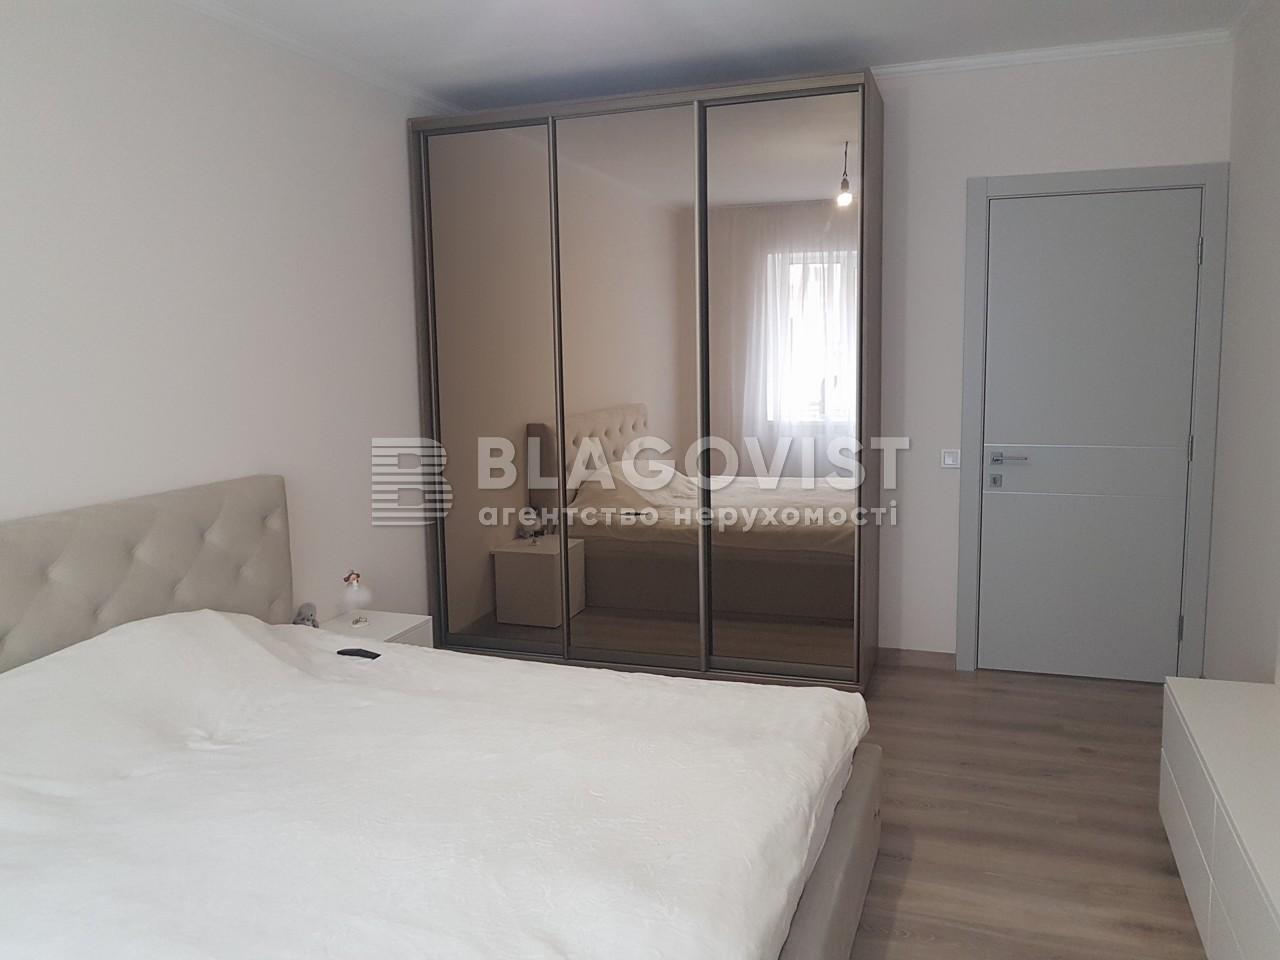 Квартира E-40784, Леси Украинки, 4, Софиевская Борщаговка - Фото 6